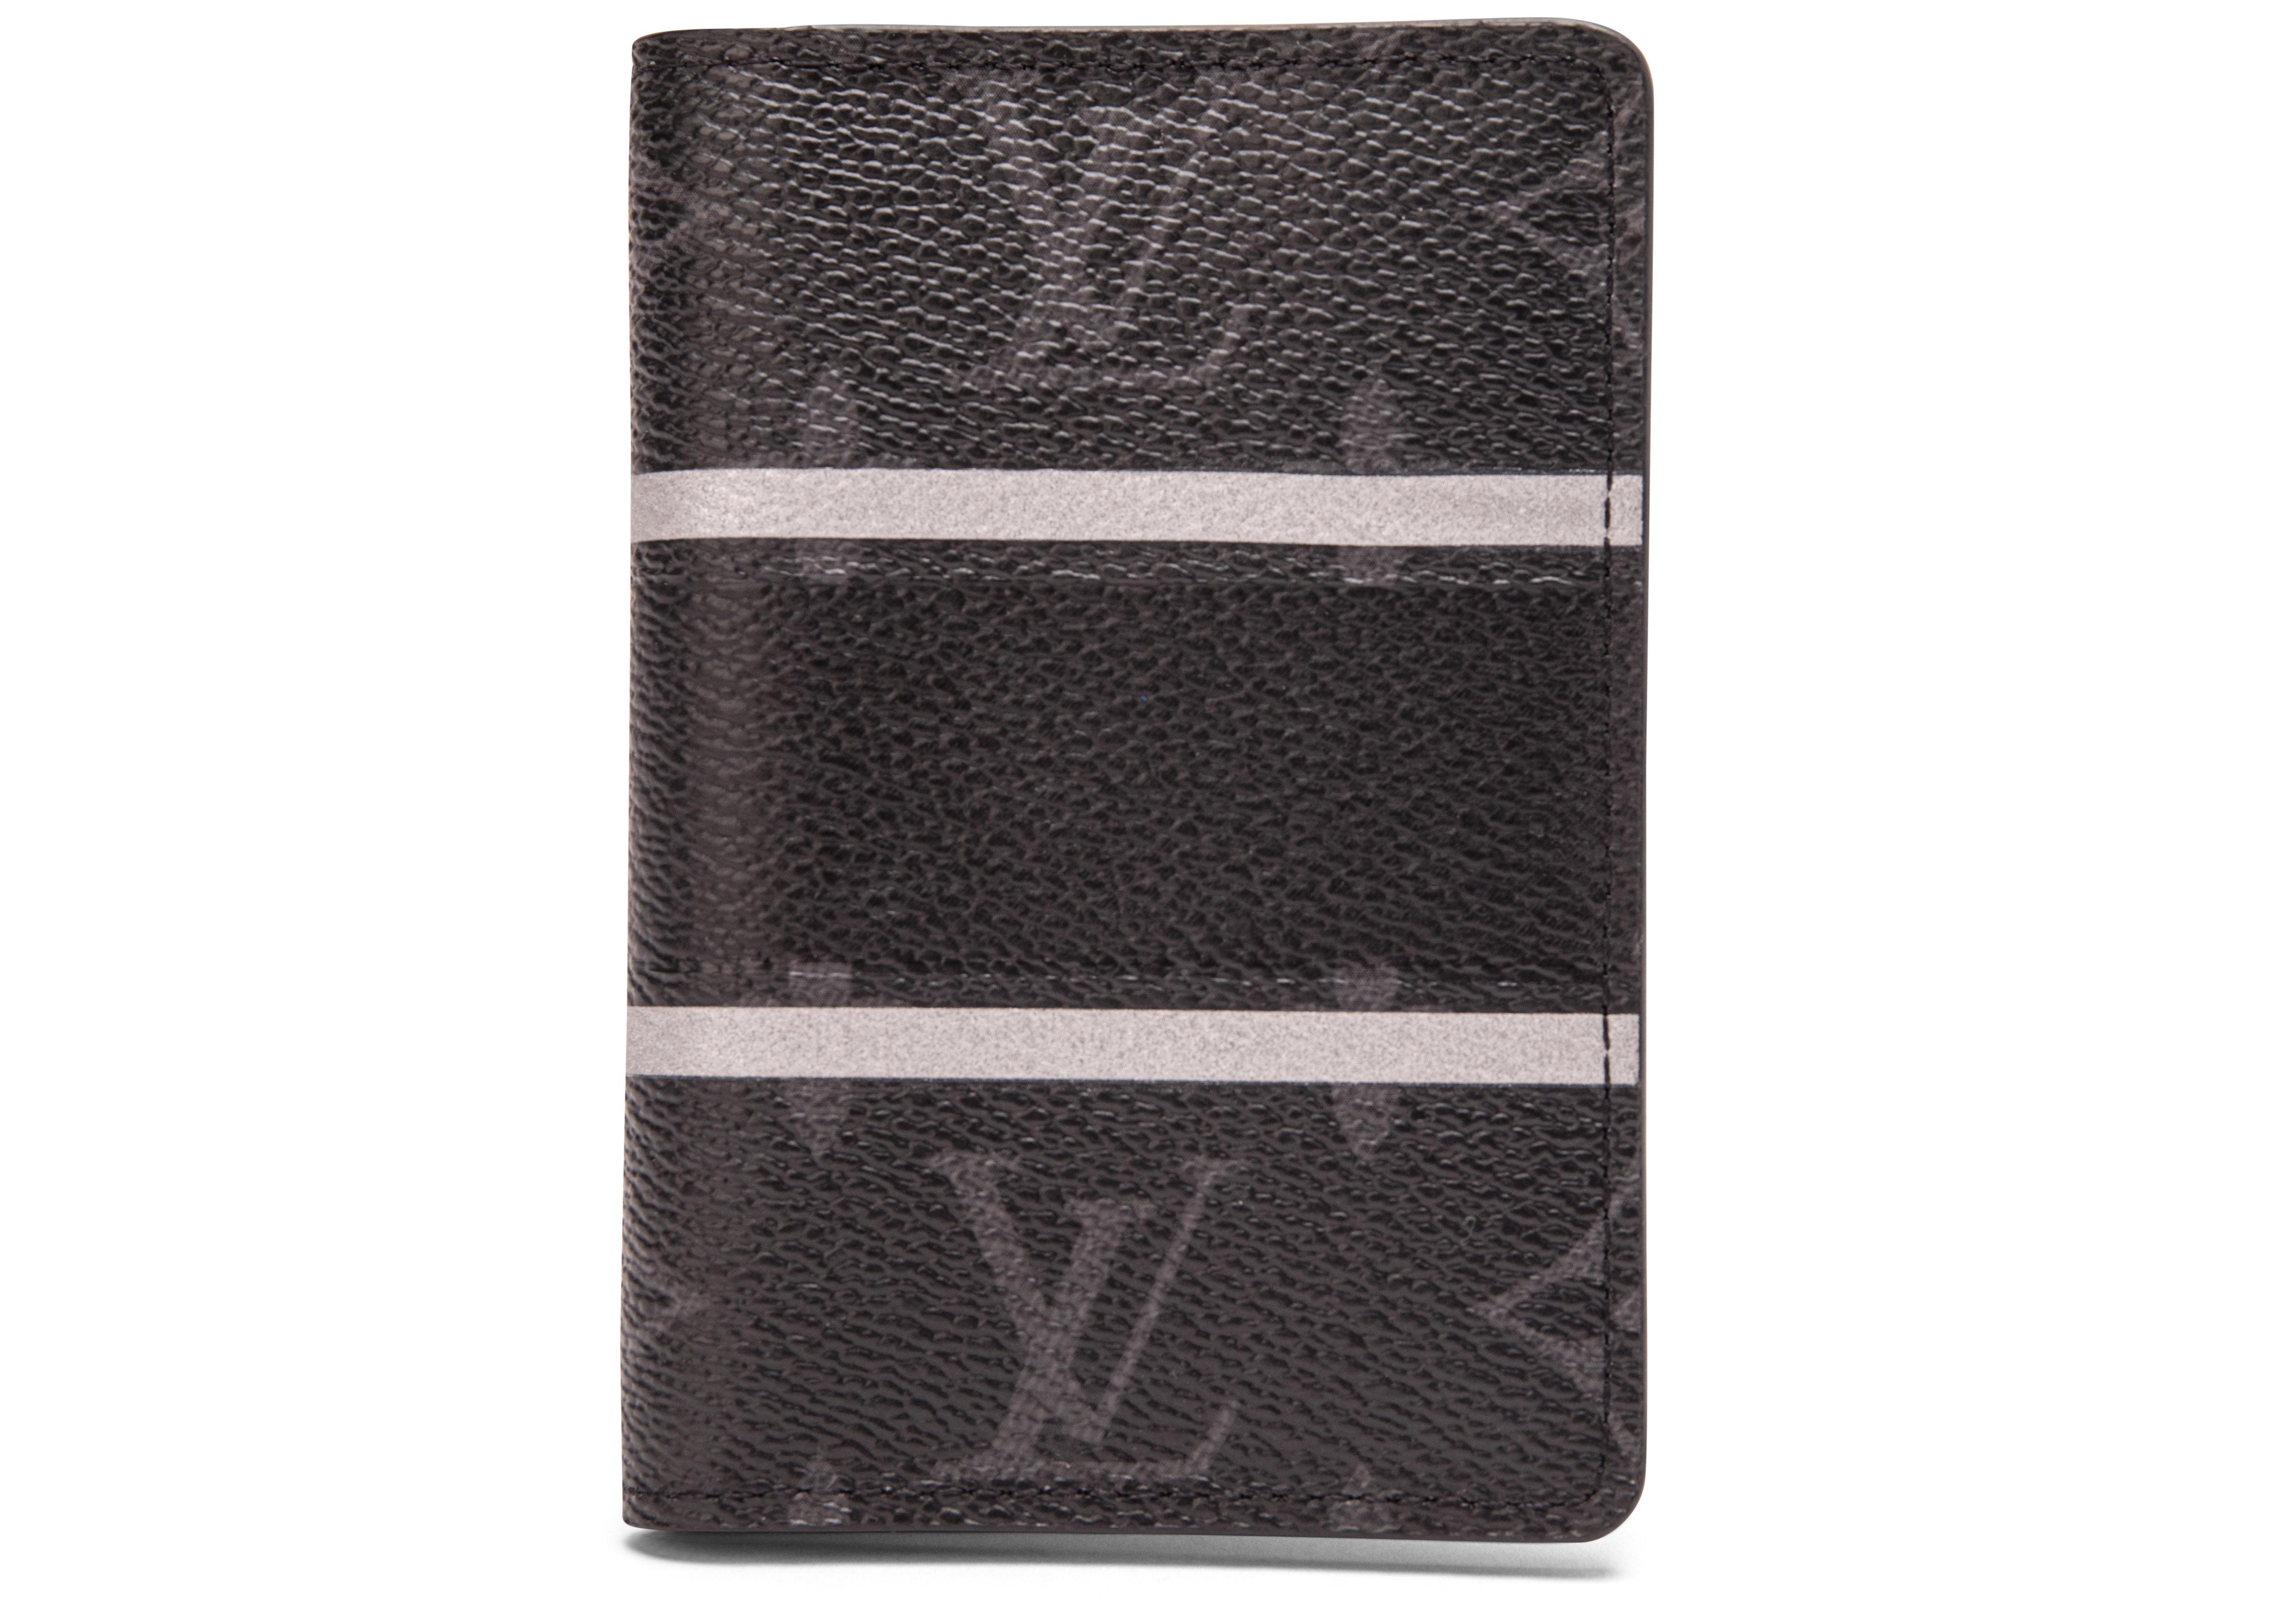 Louis Vuitton x Fragment Pocket Organizer Monogram Eclipse Black